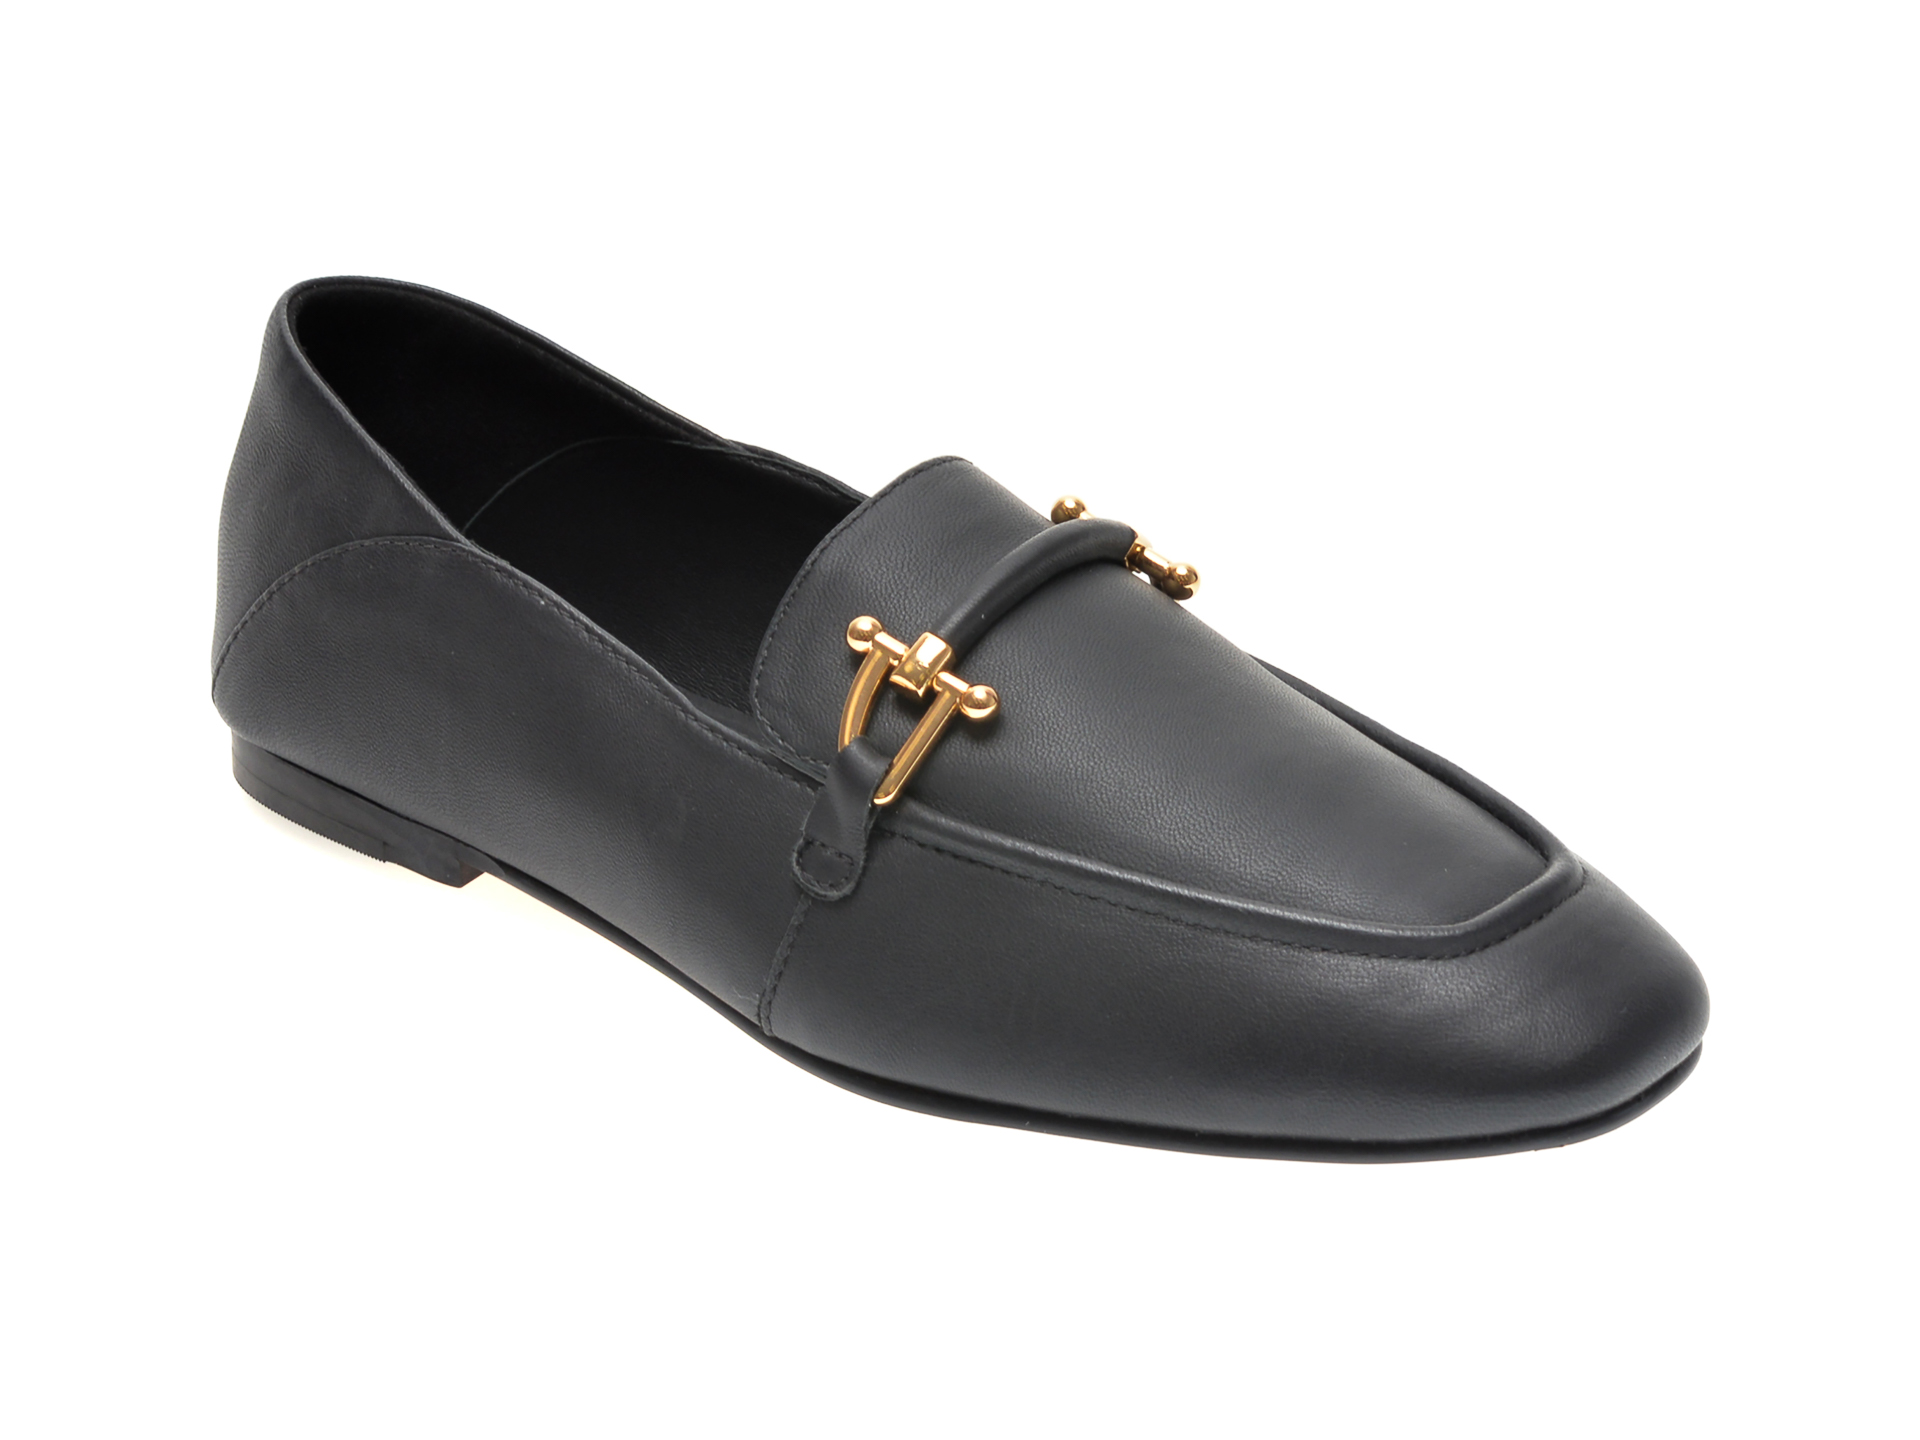 Pantofi CLARKS negri, PURE 2 LOAFER, din piele naturala imagine otter.ro 2021